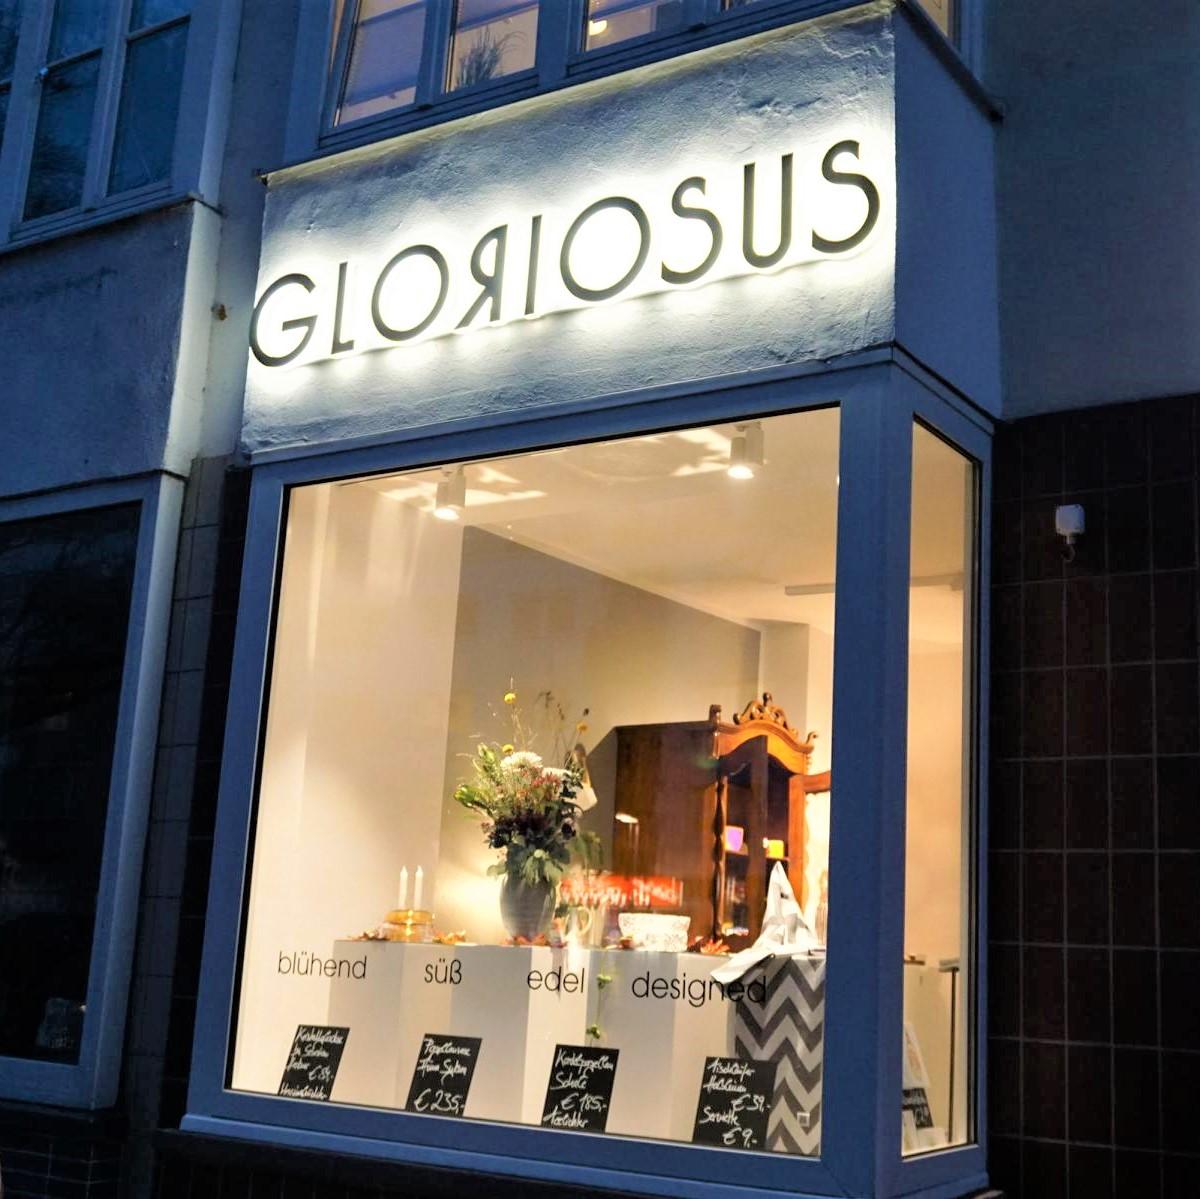 Style Hannover Gloriosus 2 - Gloriosus - Deko und Geschenke edel & süß